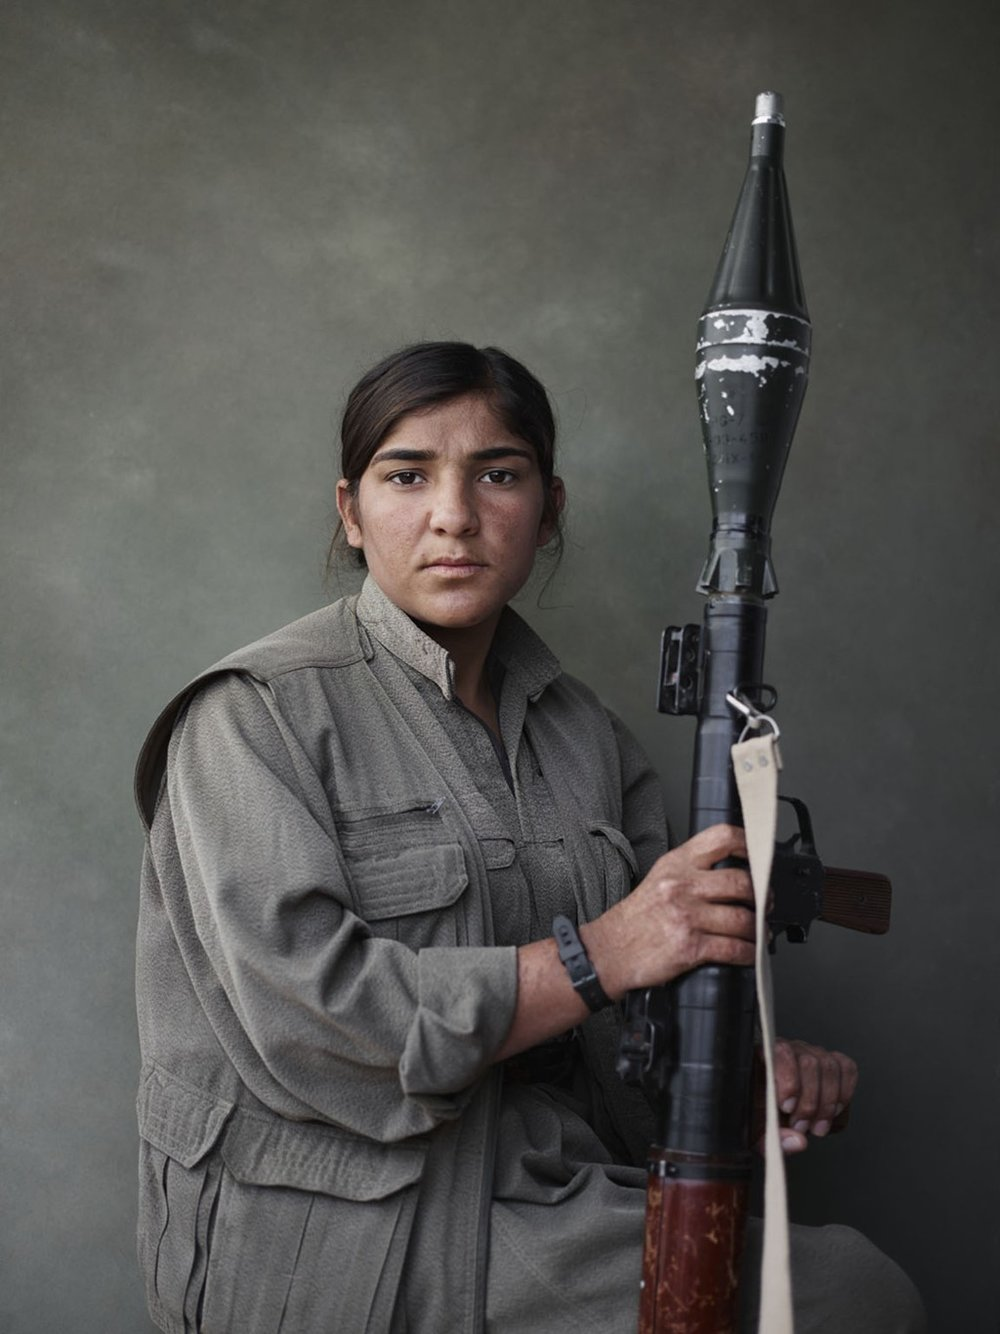 Sarya-RPG-PKK-Kurdistan-Workers-Party-Makhmour-Iraq-Guerrilla_Fighters_of_Kurdistan_Joey_L_Photographer_008.jpg